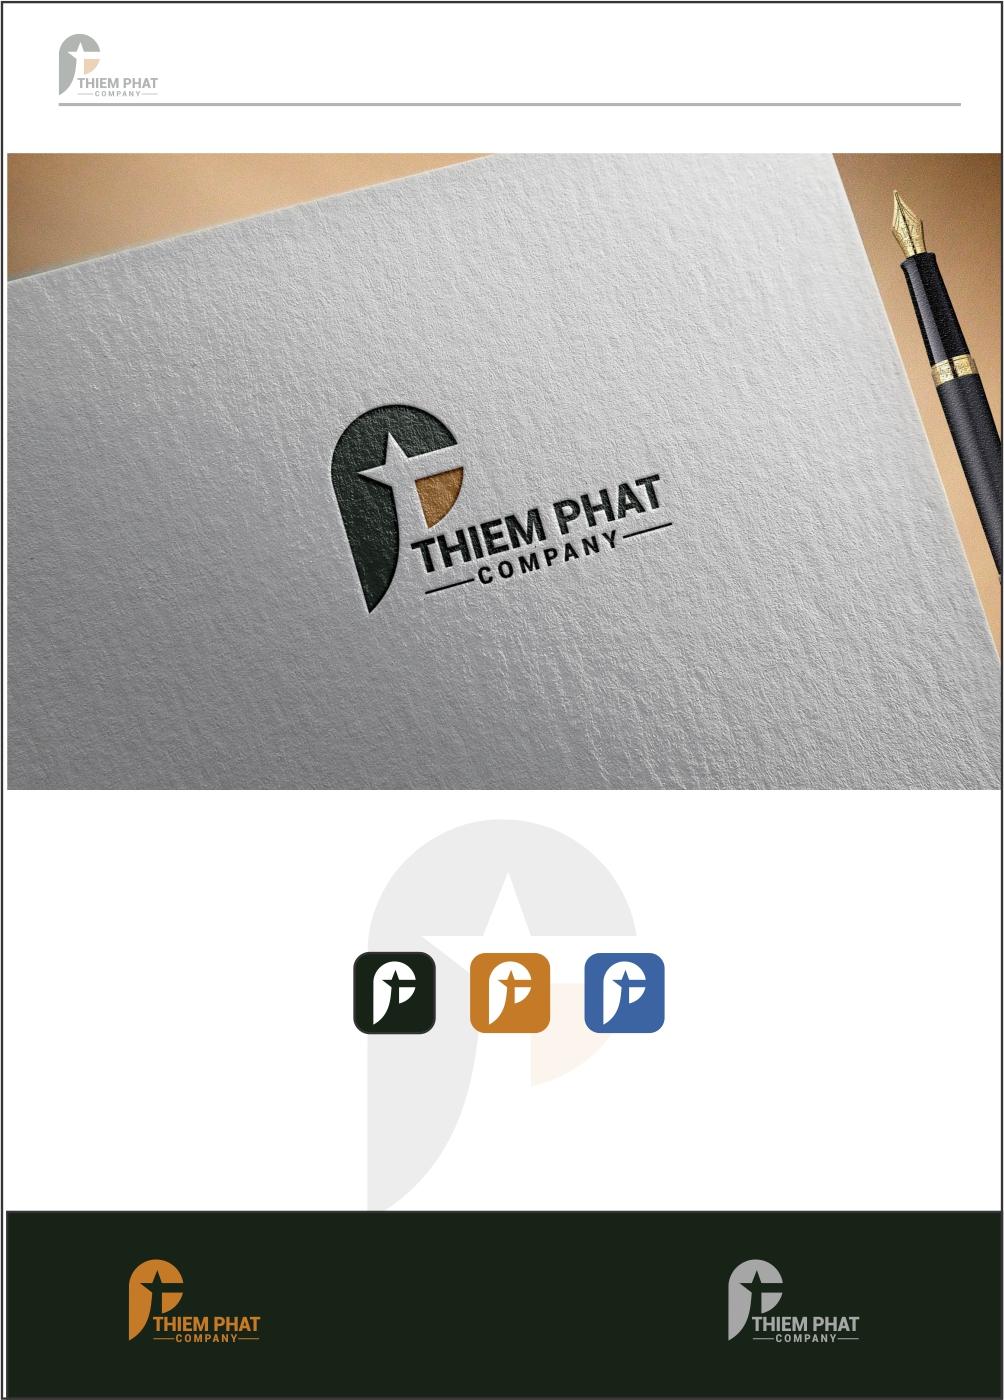 Logo Design by ian69 - Entry No. 91 in the Logo Design Contest New Logo Design for Thiem Phat company.